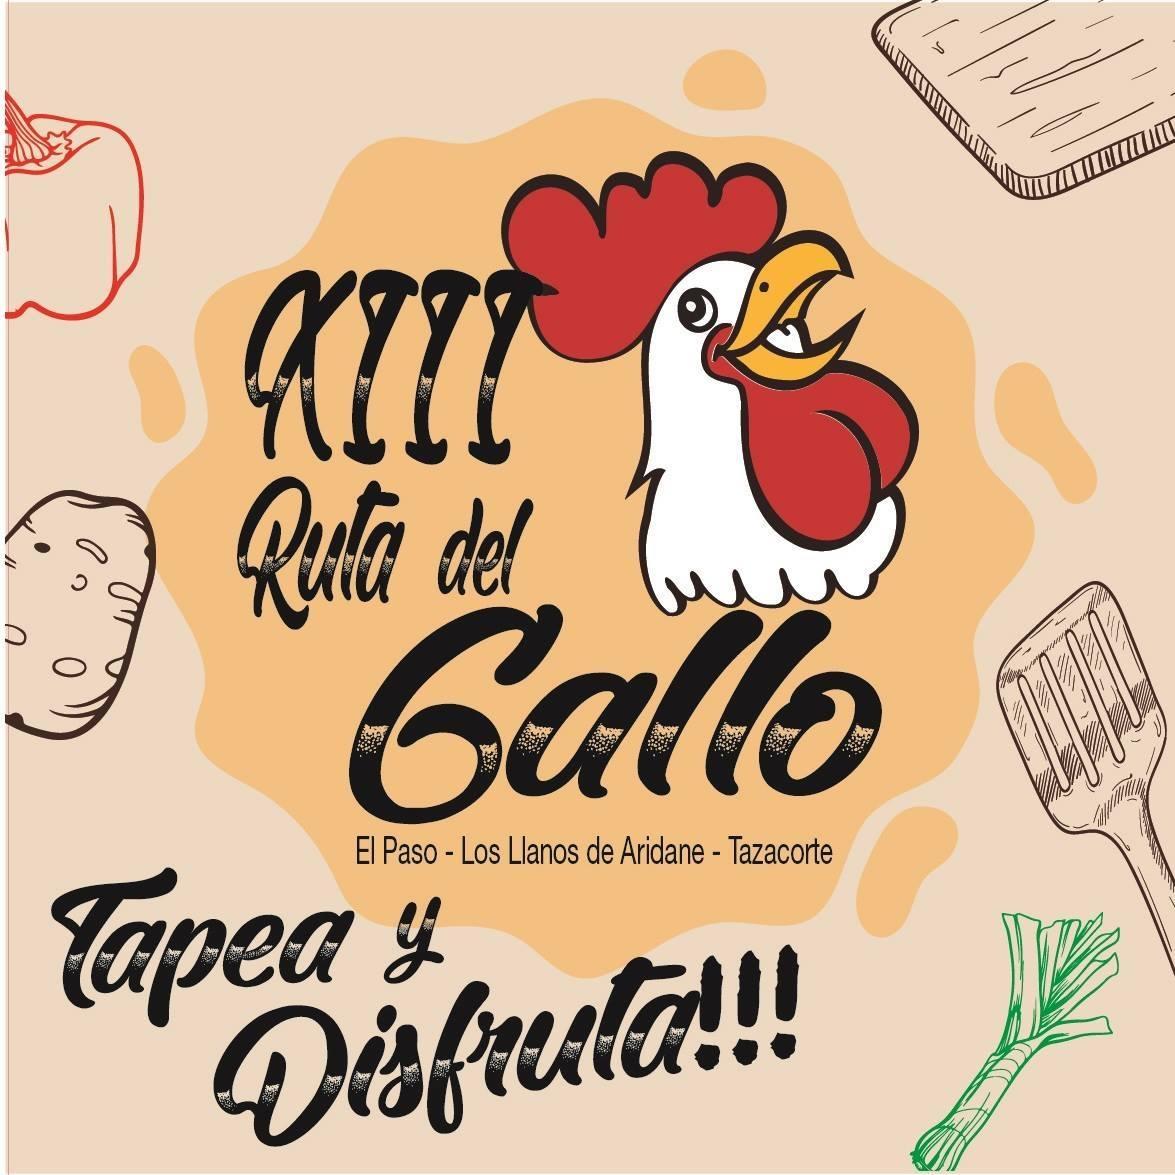 Visit La Palma - Ruta del Gallo